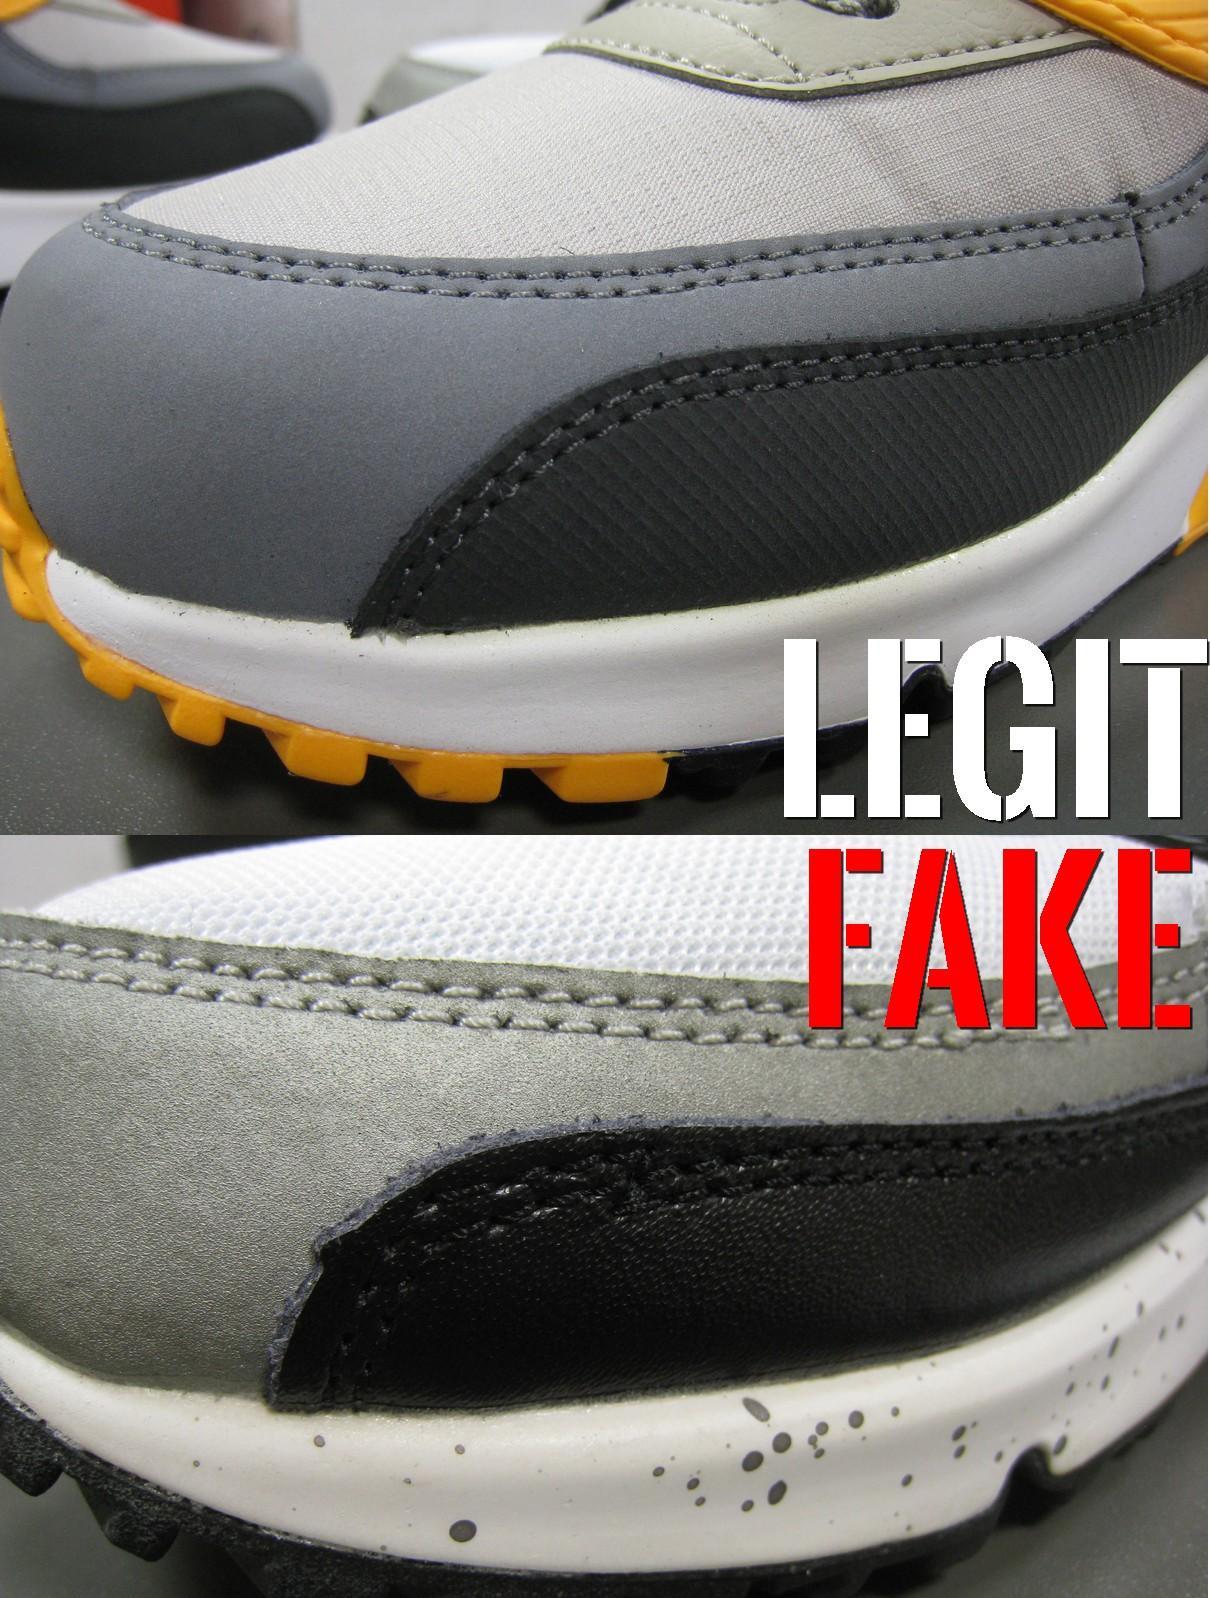 podróbka Nike Air Max 90 przód butów